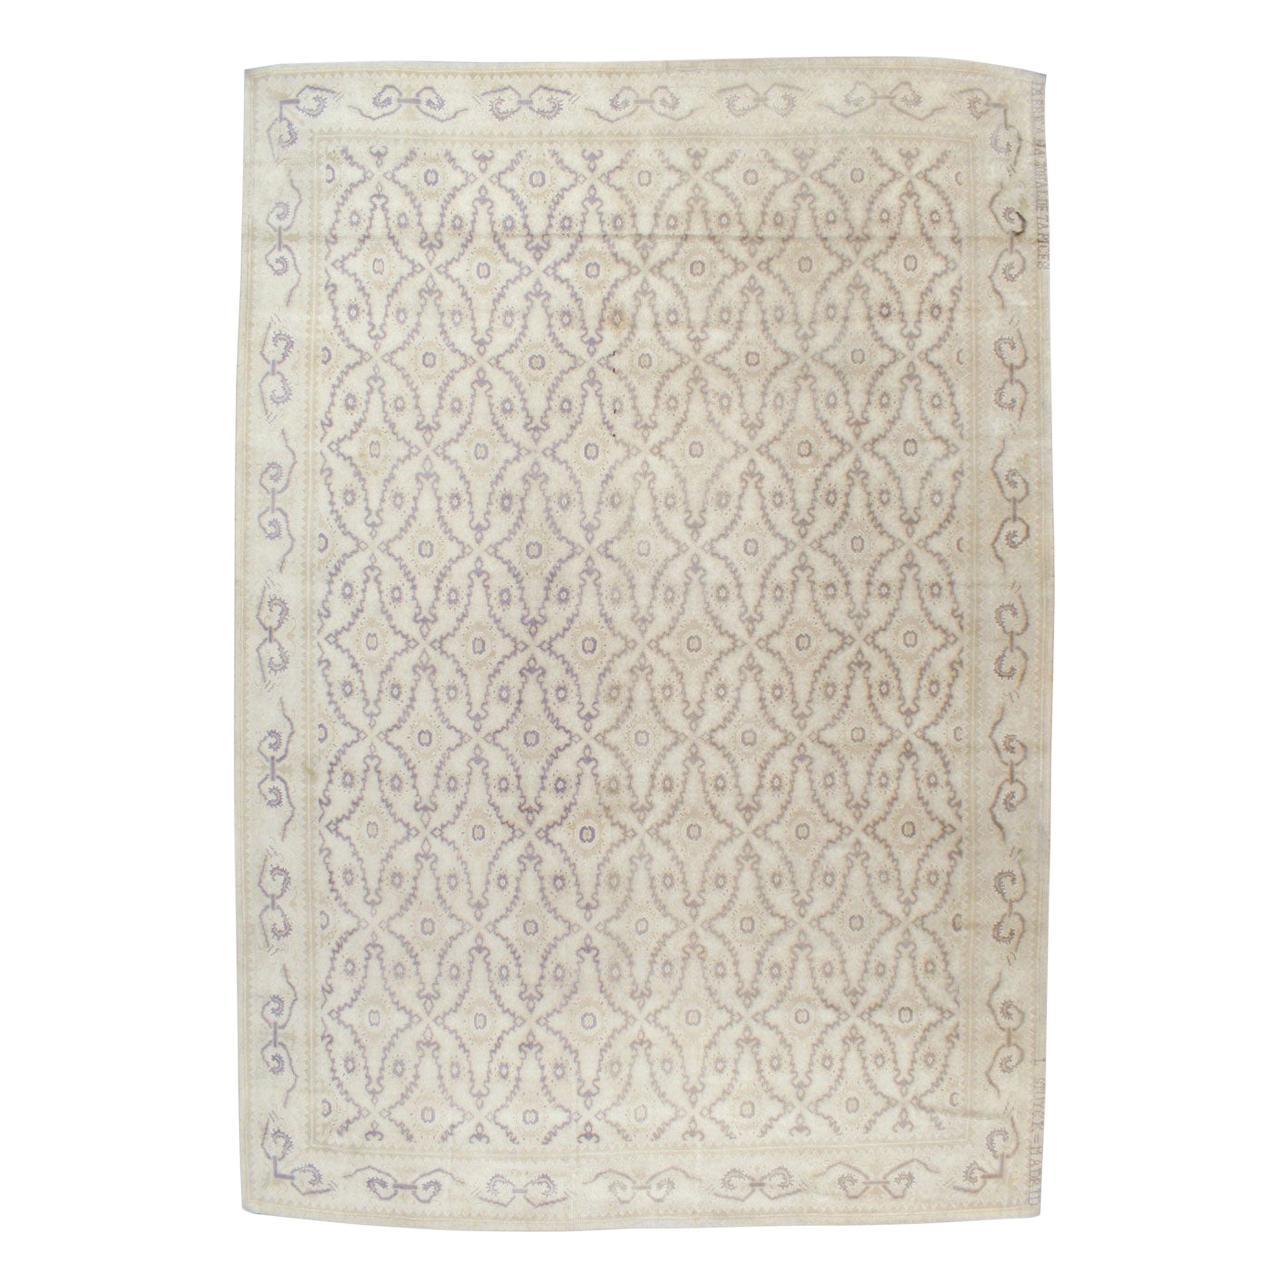 Mid-20th Century Spanish Cuenca Large Carpet by Fabrica Nacional De Tapices